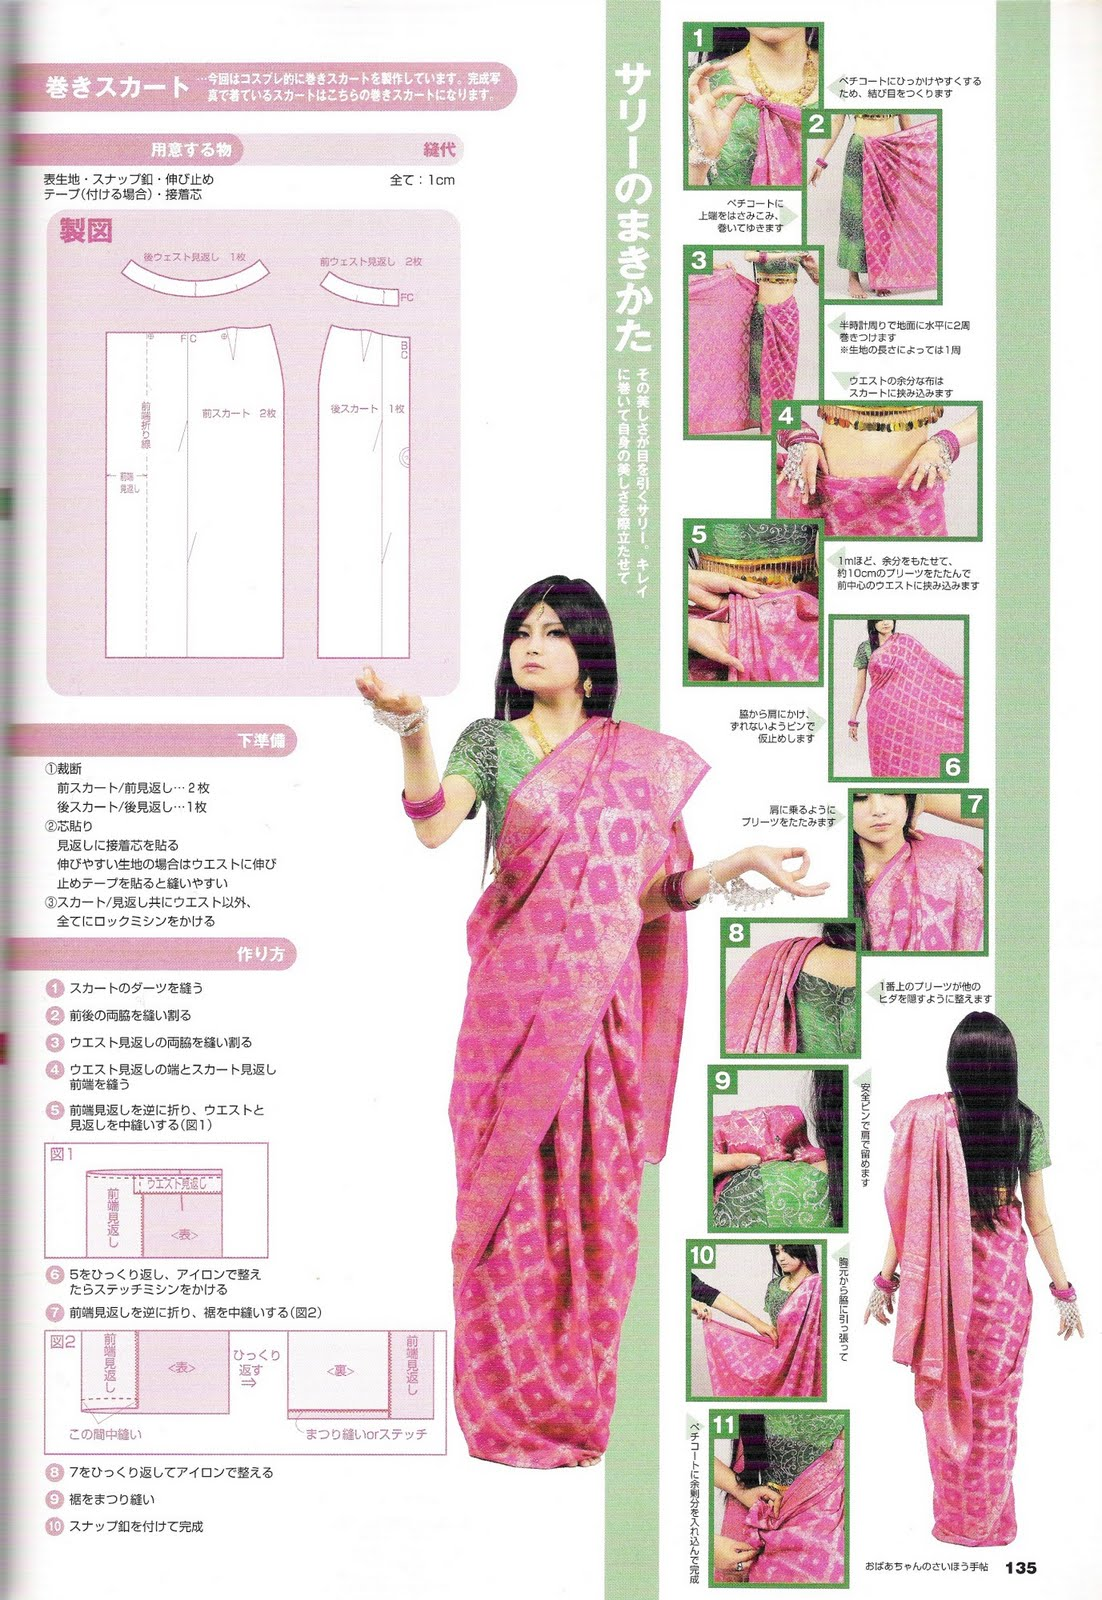 Aprendiz de Cosplayer: Patrones: ropa hindú (kurta, choli, sari)